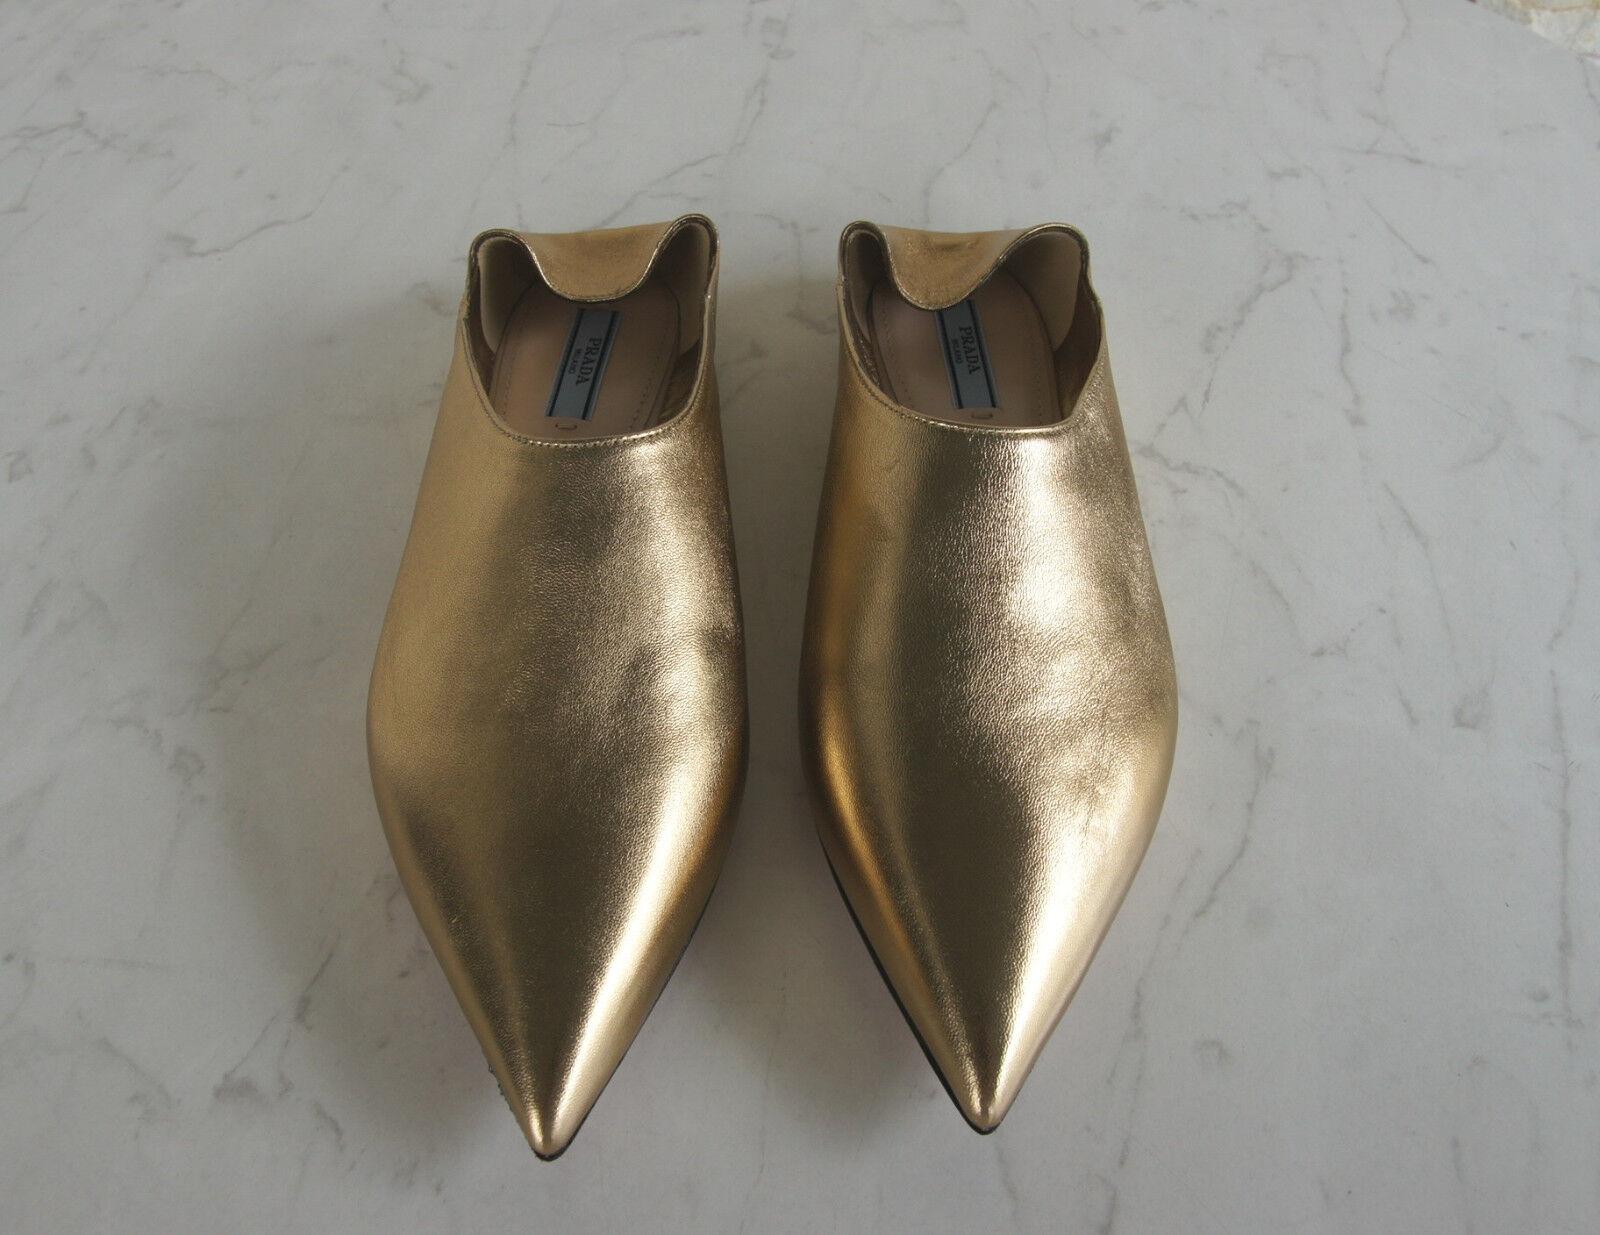 PRADA Gr 36 Pantoletten Slipper NEU Sabots 1S574H Schuhe Halbschuhe NEU Slipper ca2b44